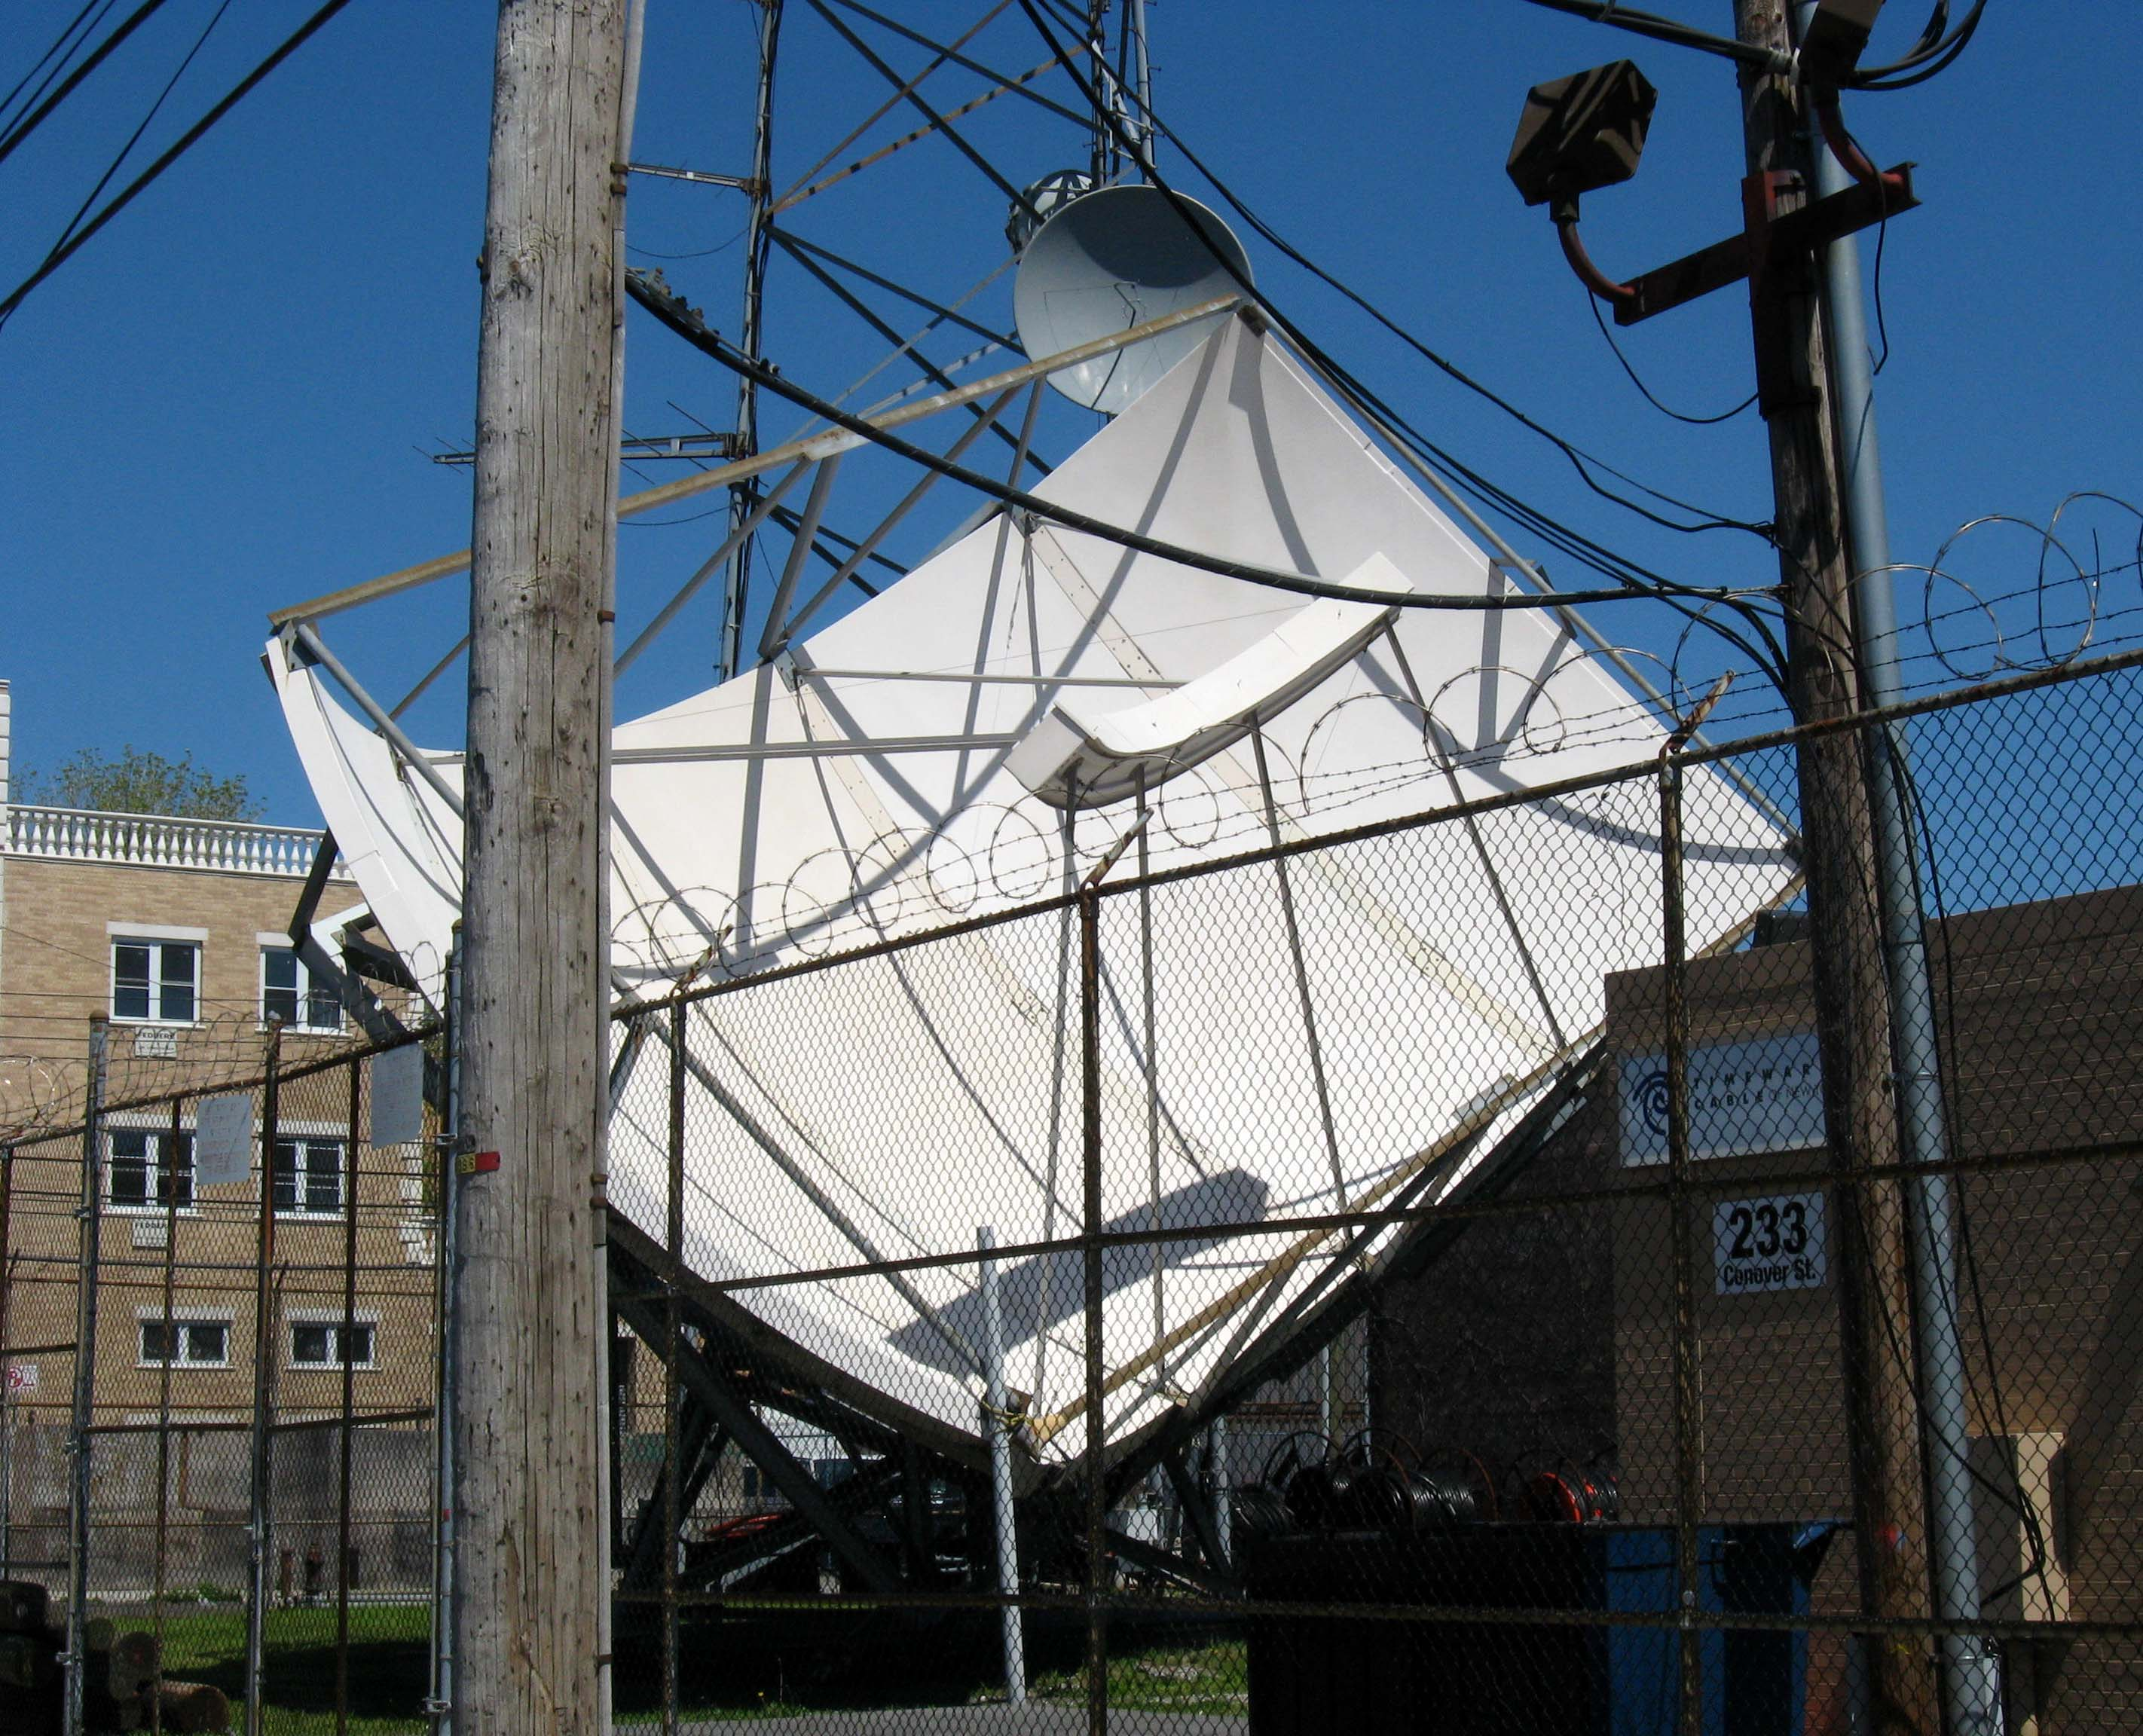 Cable television headend - Wikipedia